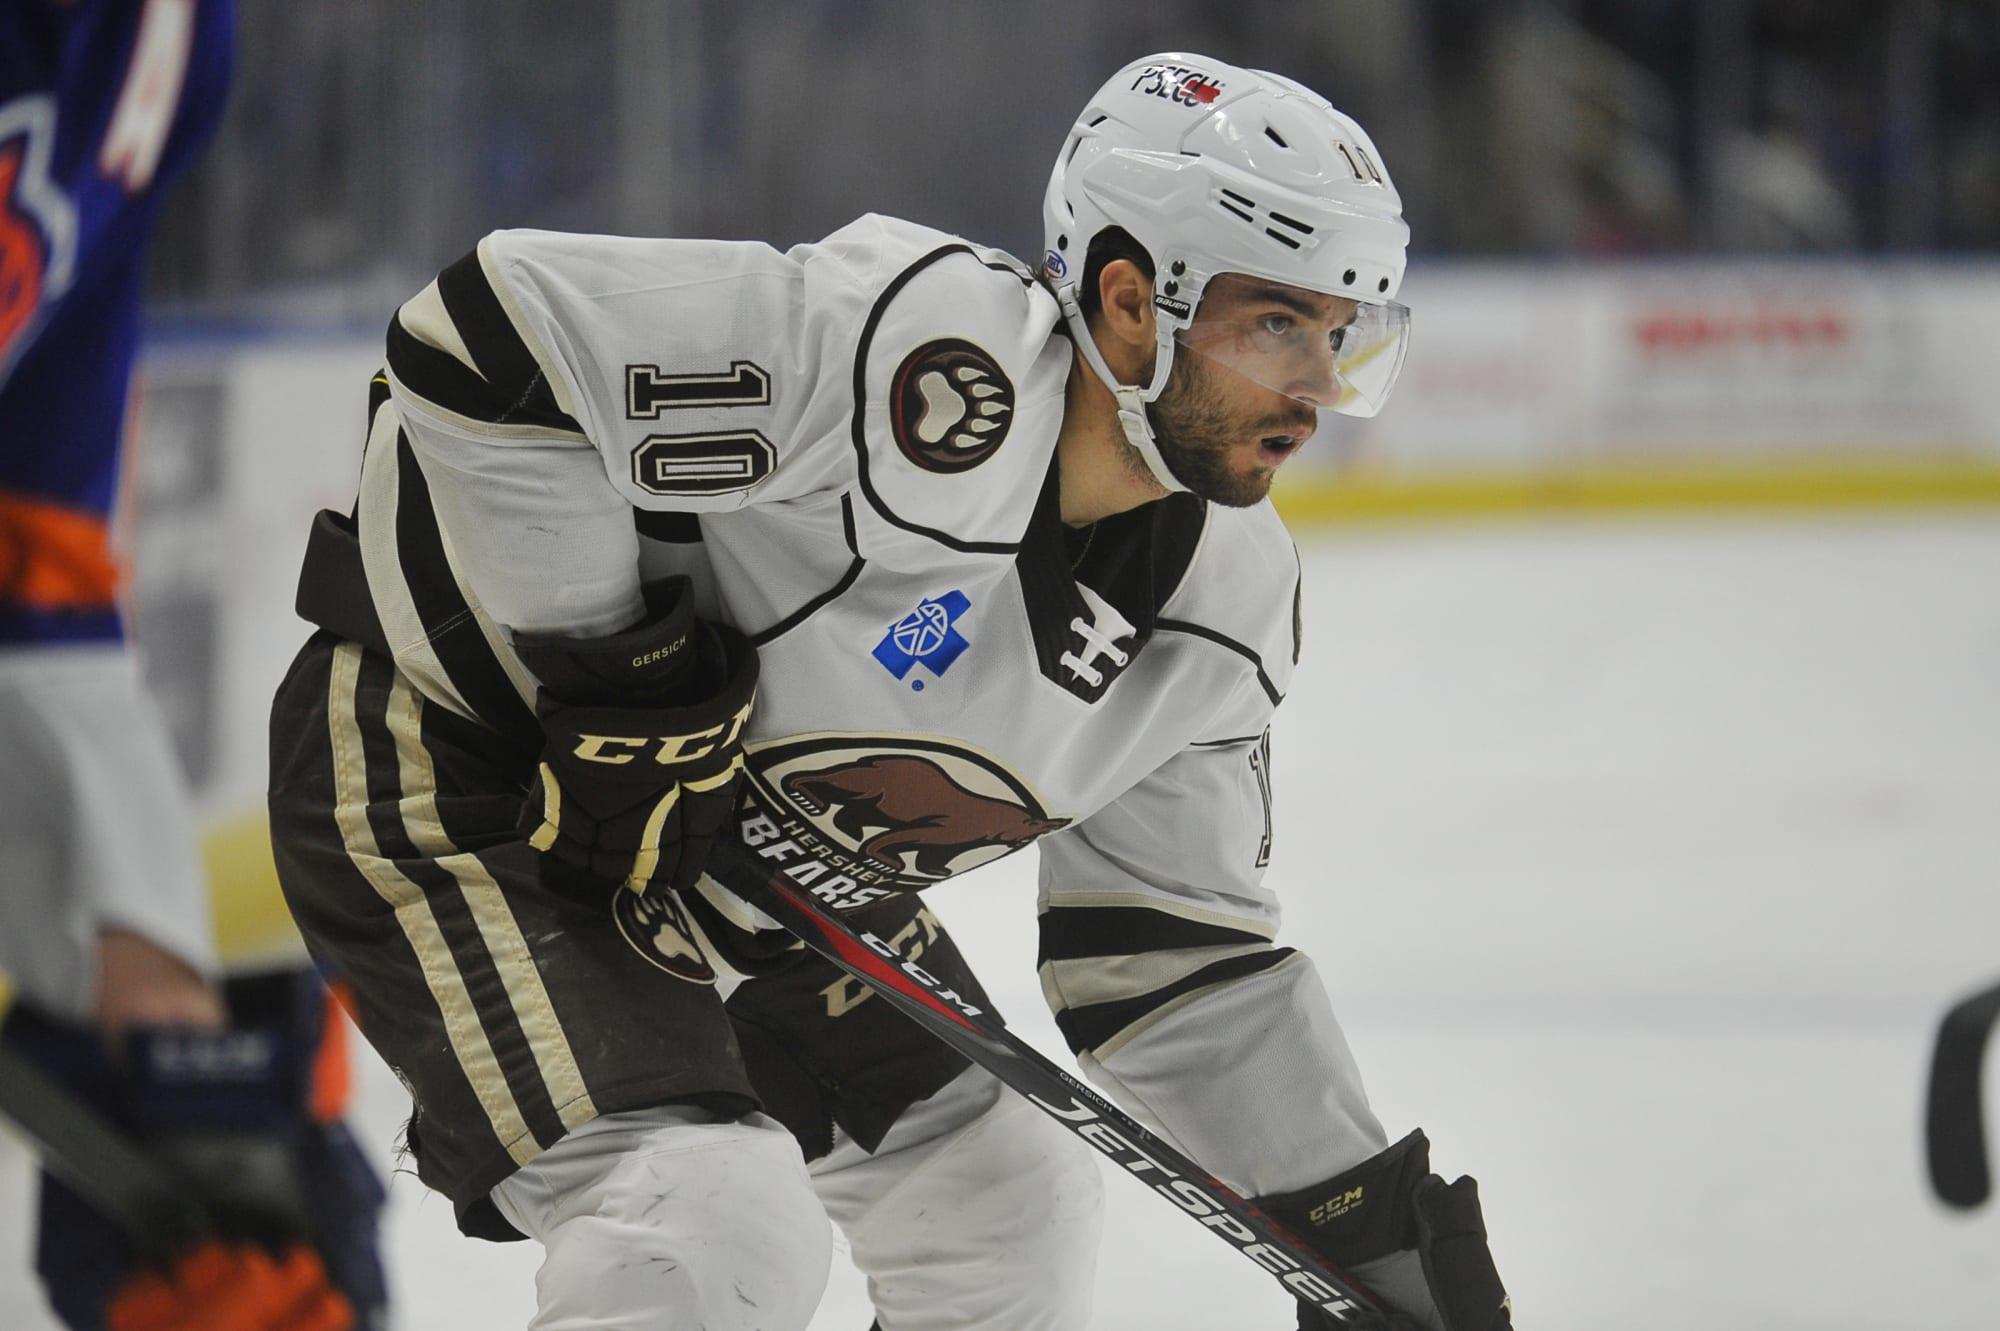 Hershey Bears and community feel the brunt of AHL season's cutoff